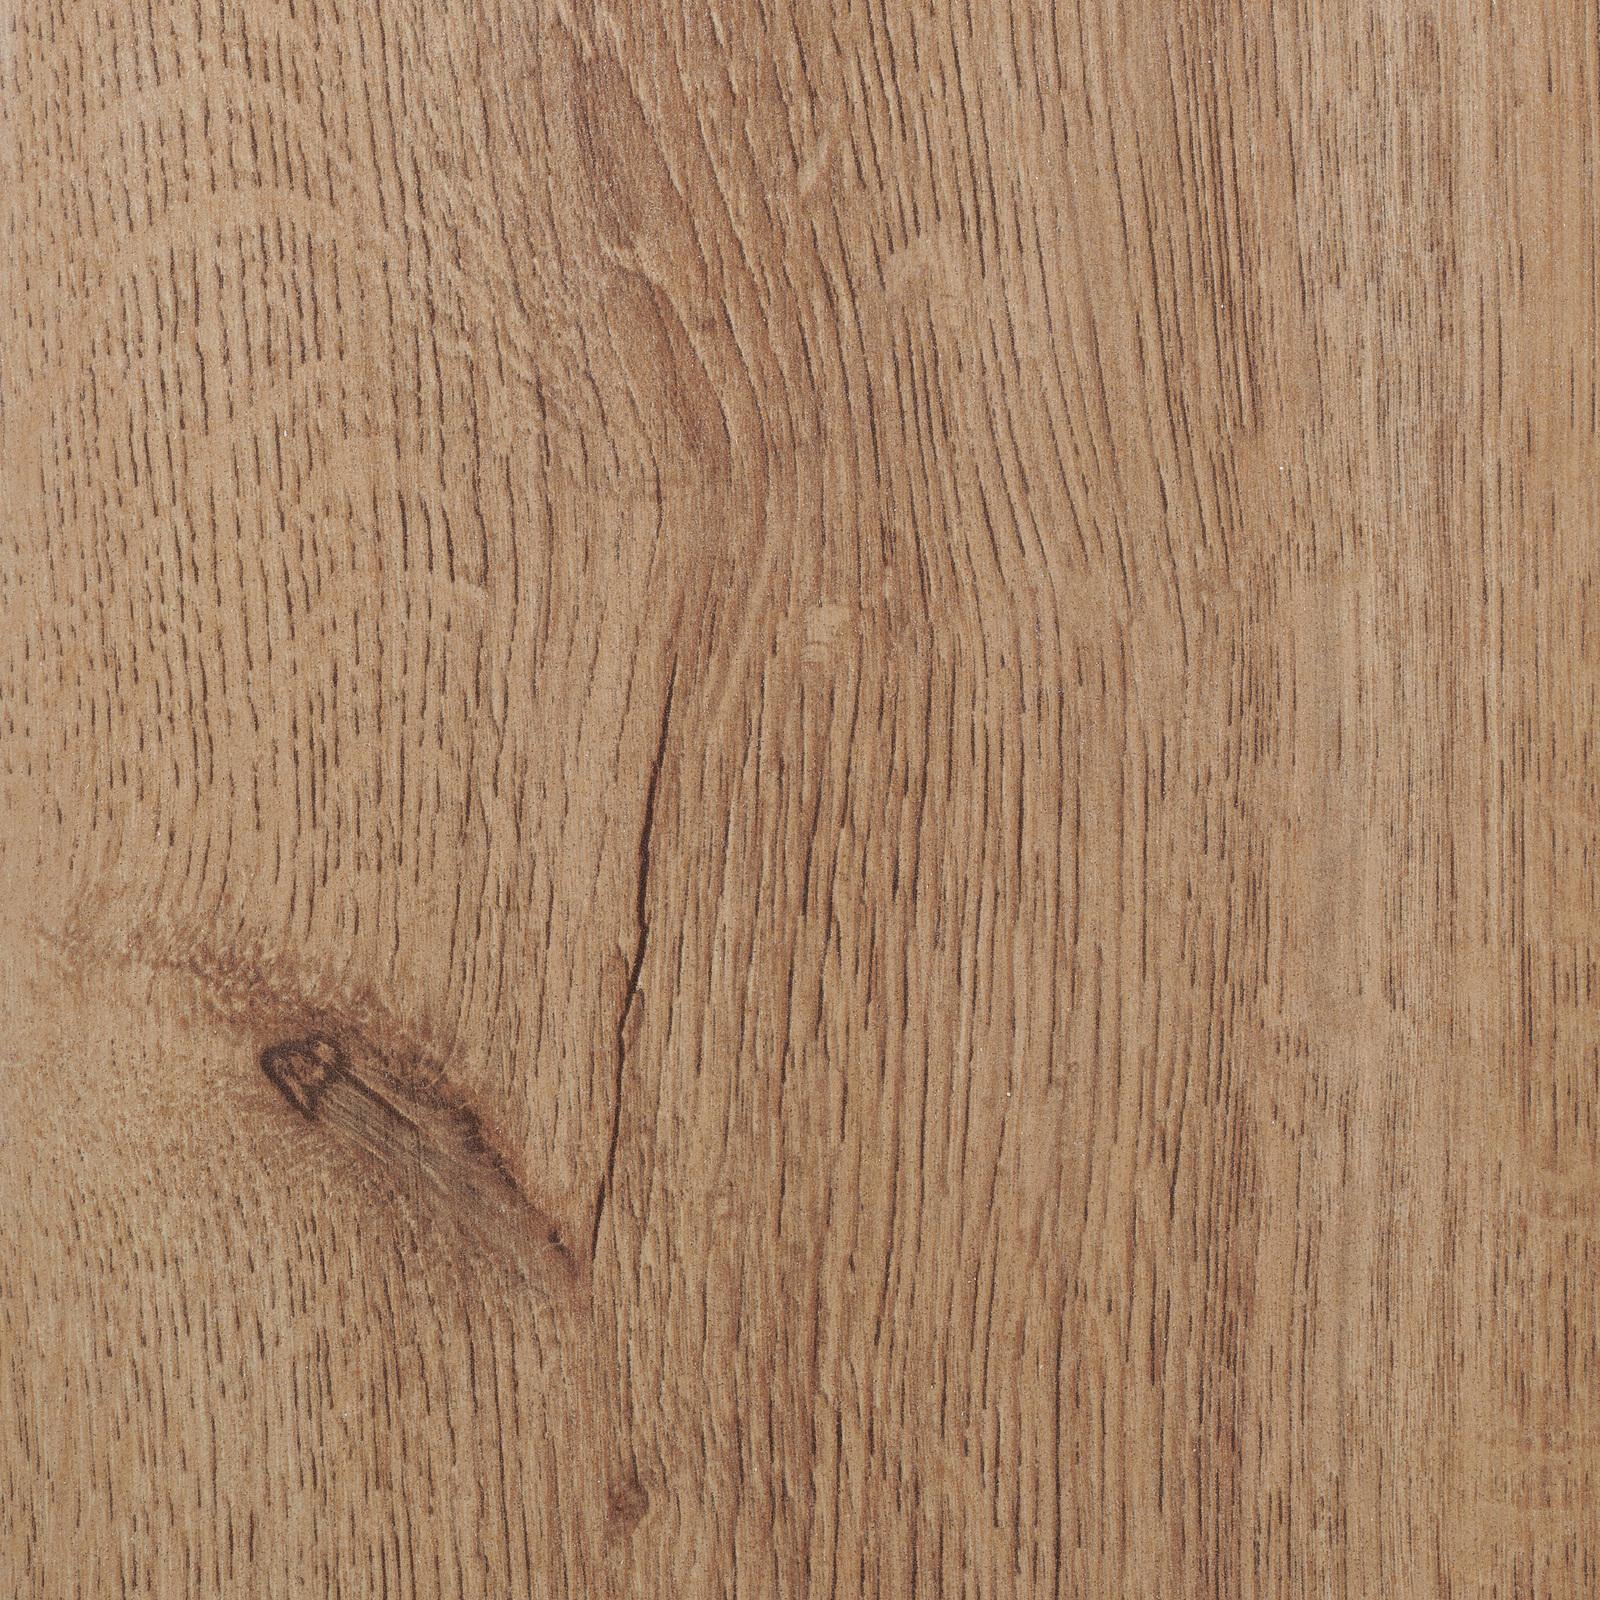 BASIC Laminat Trend Oak Natur 1-Stab